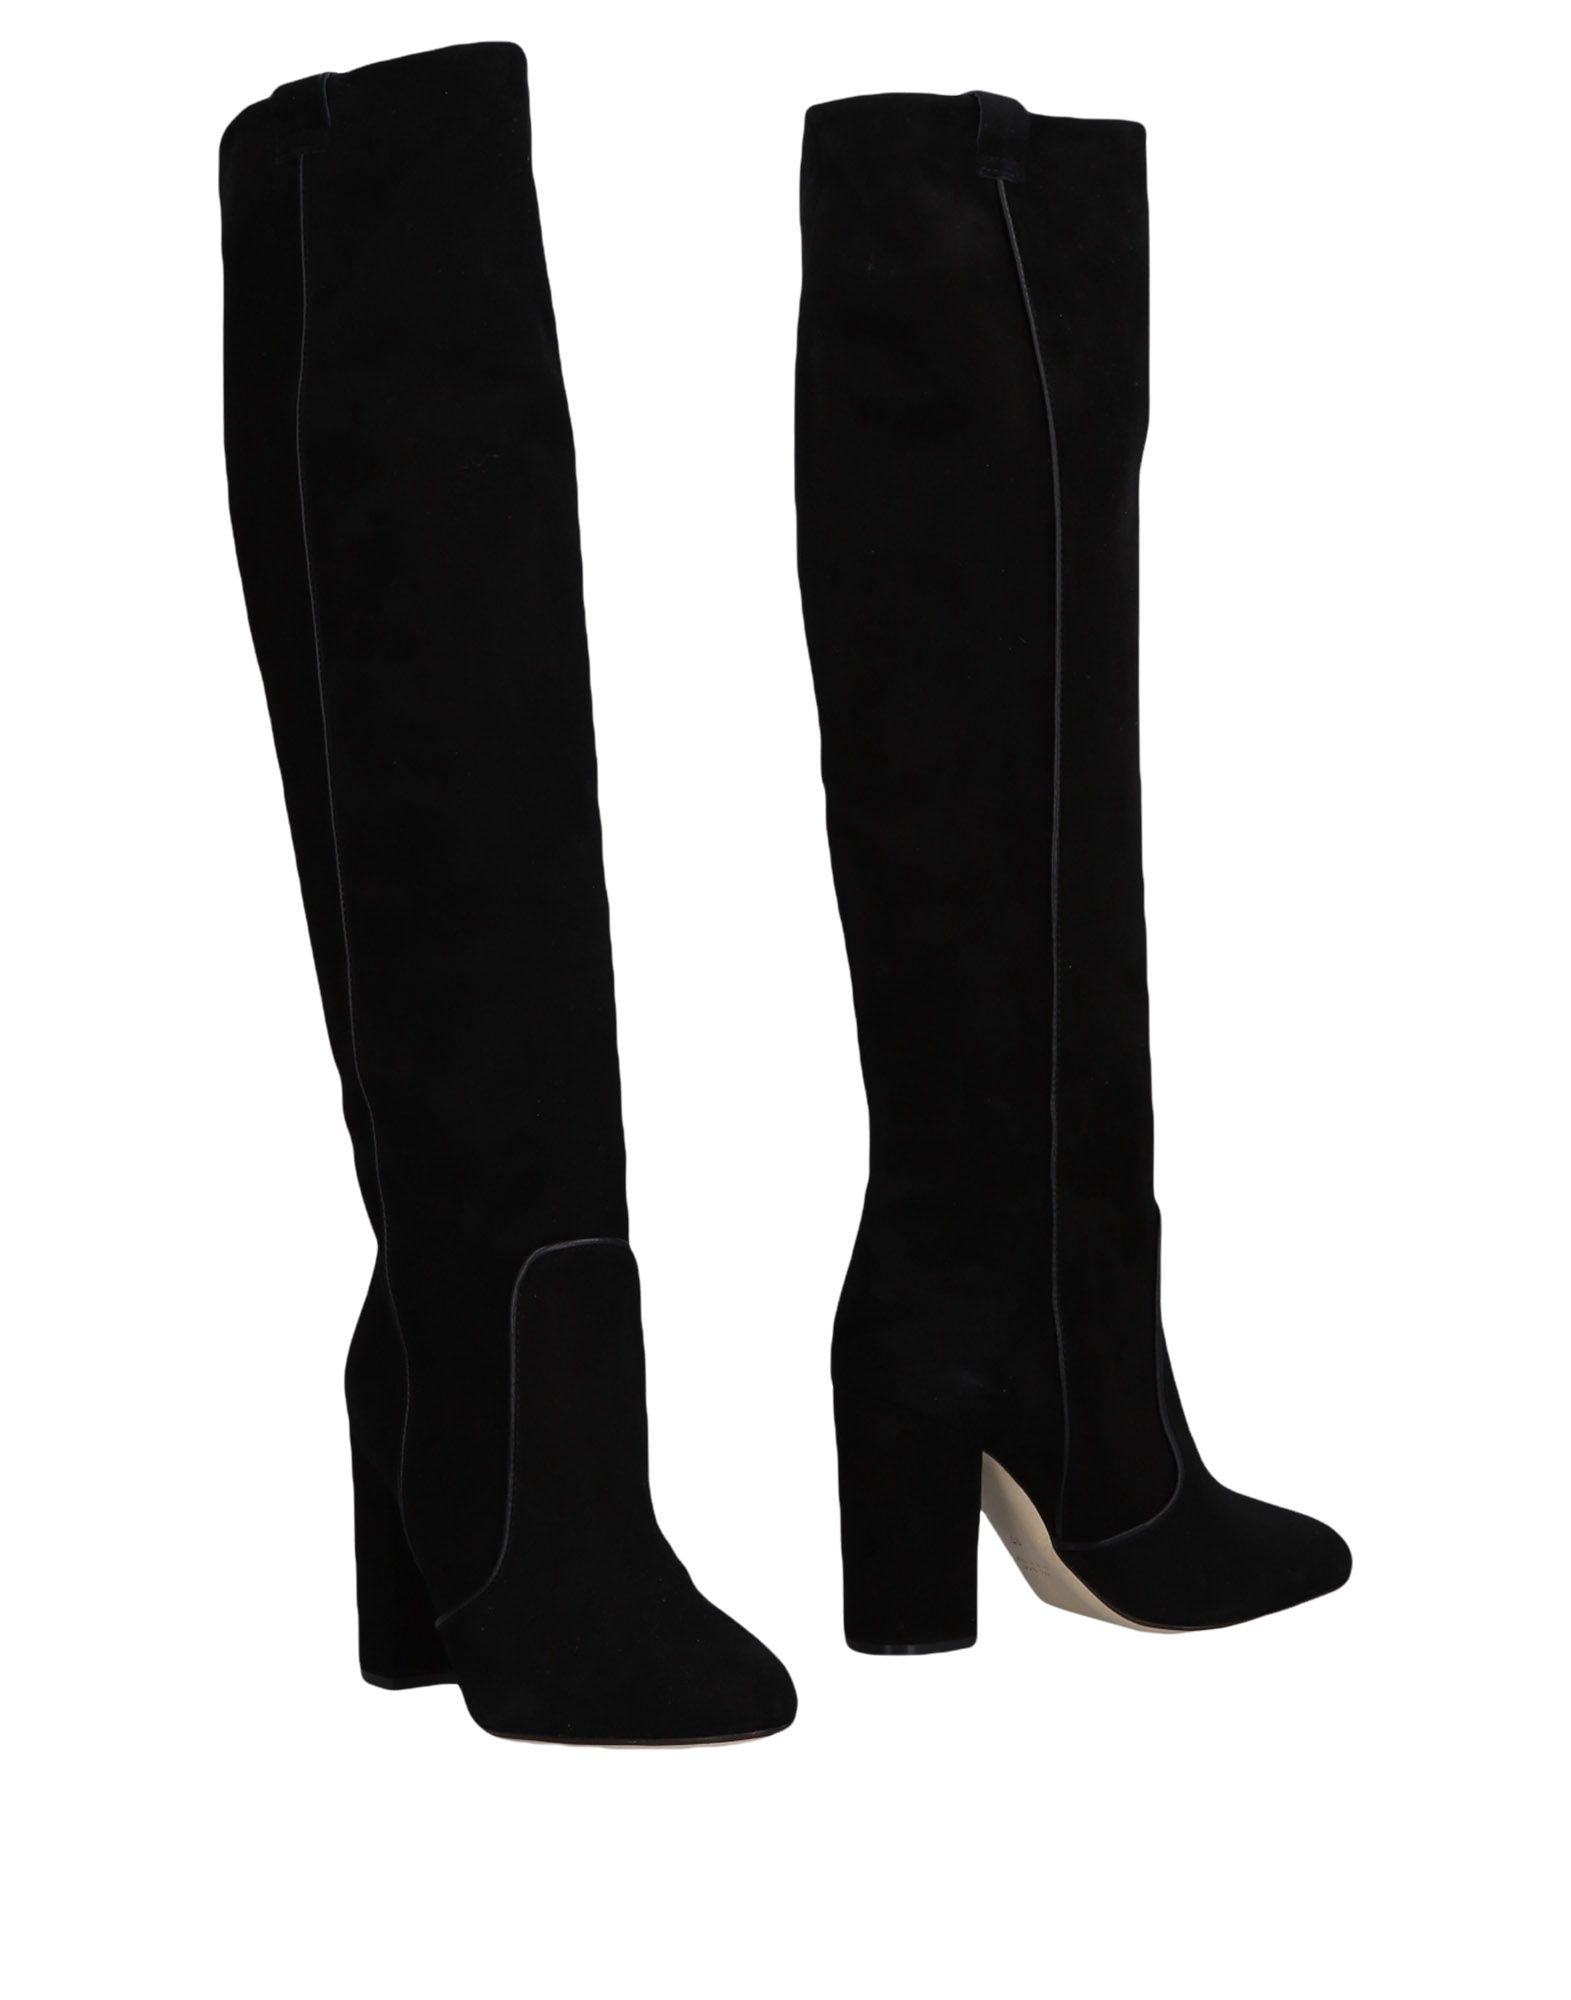 Giampaolo Viozzi Stiefel Damen  11475874RKGut aussehende strapazierfähige Schuhe